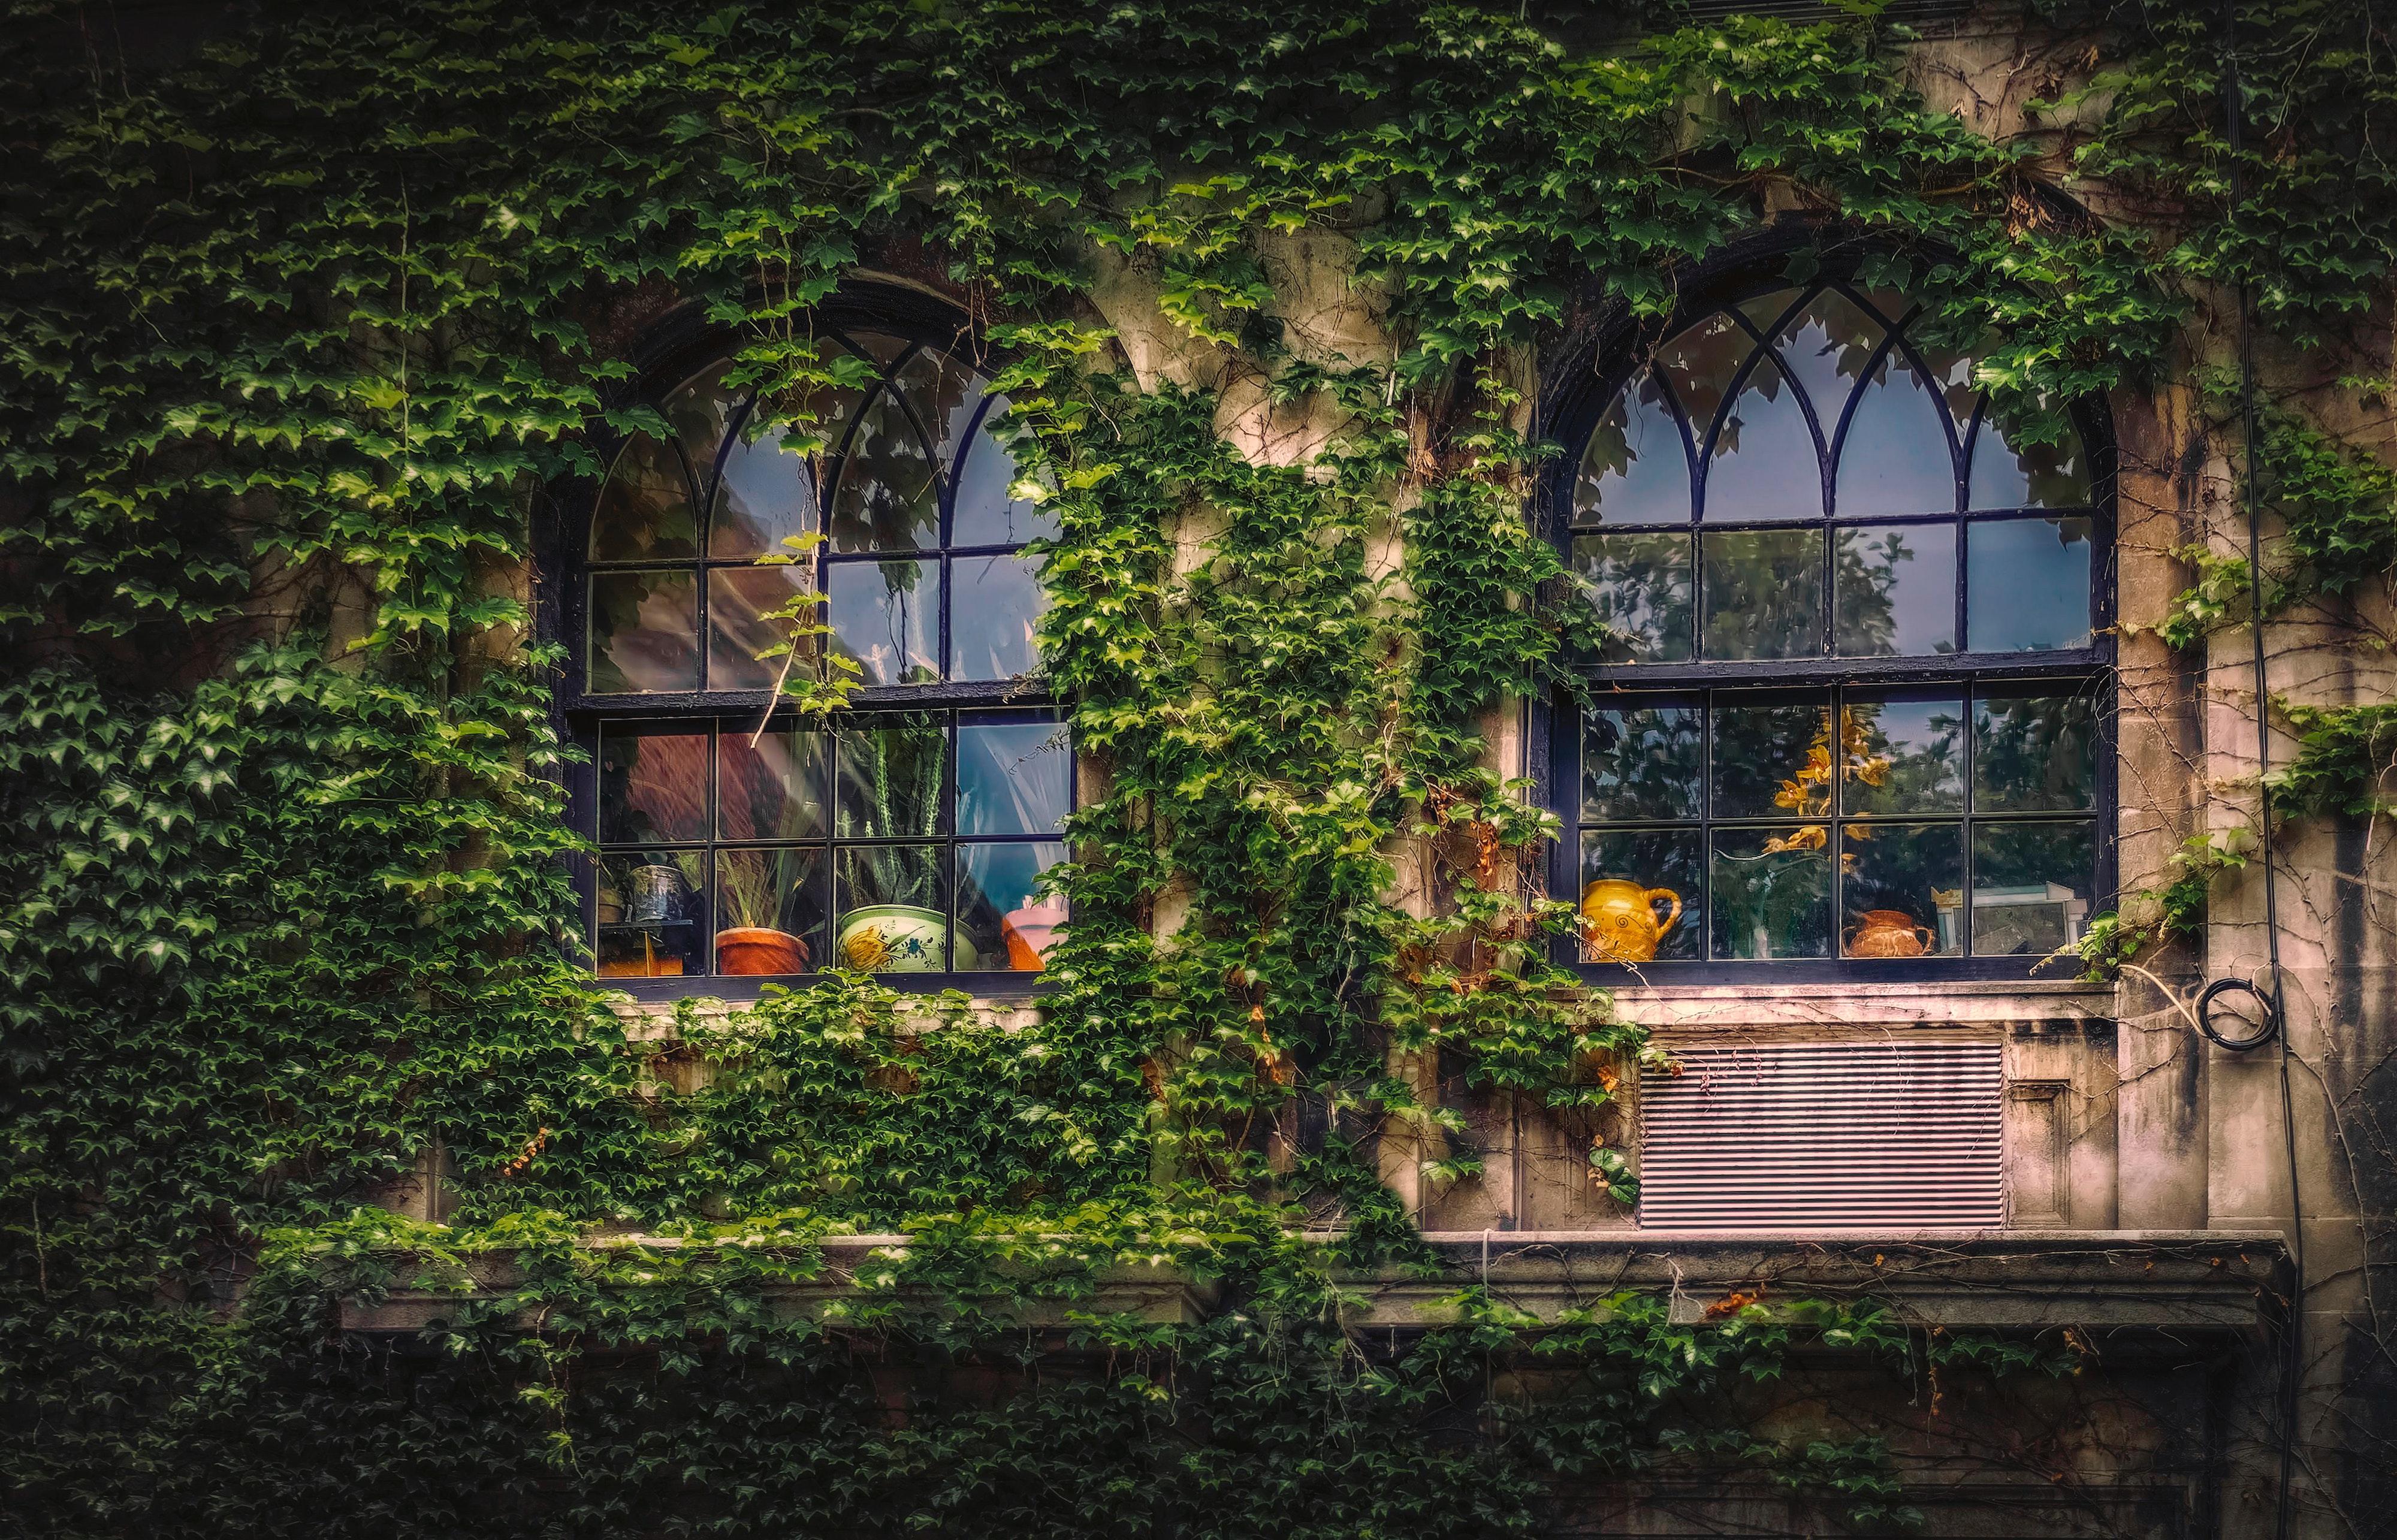 Black metal frame glass window photo